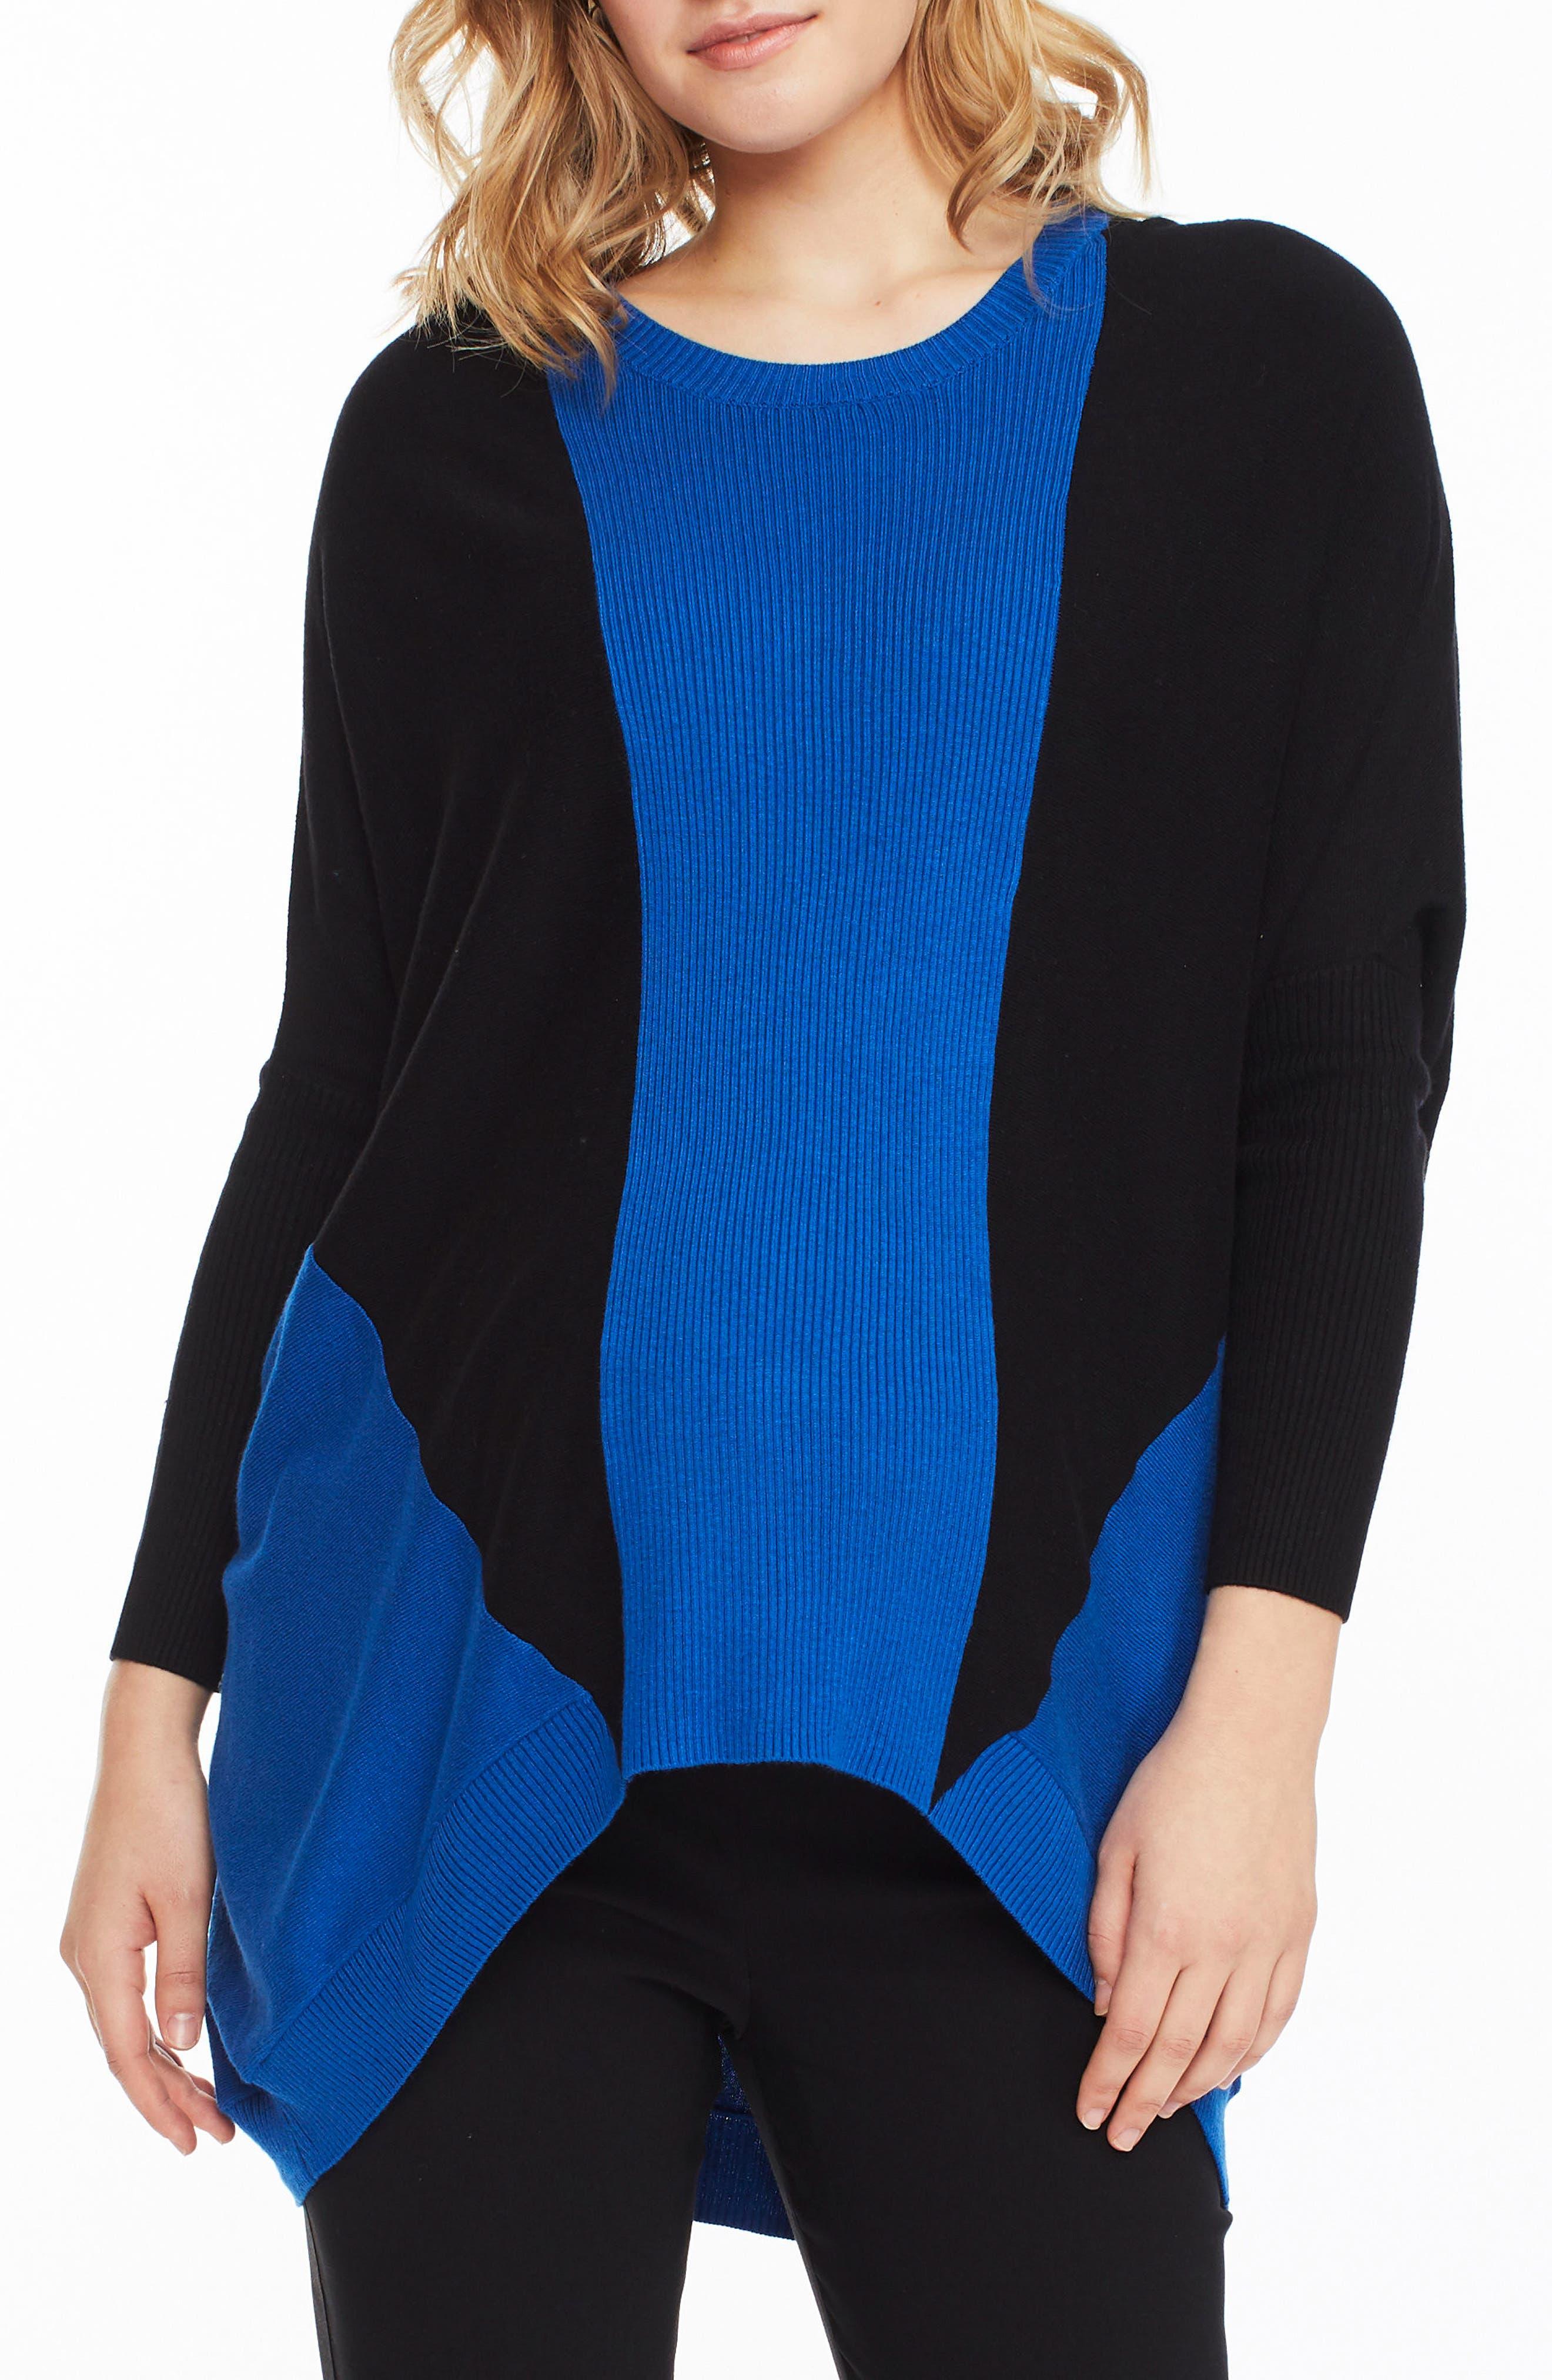 ROSIE POPE Hazel Colorblock Maternity Sweater in Indigo / Black